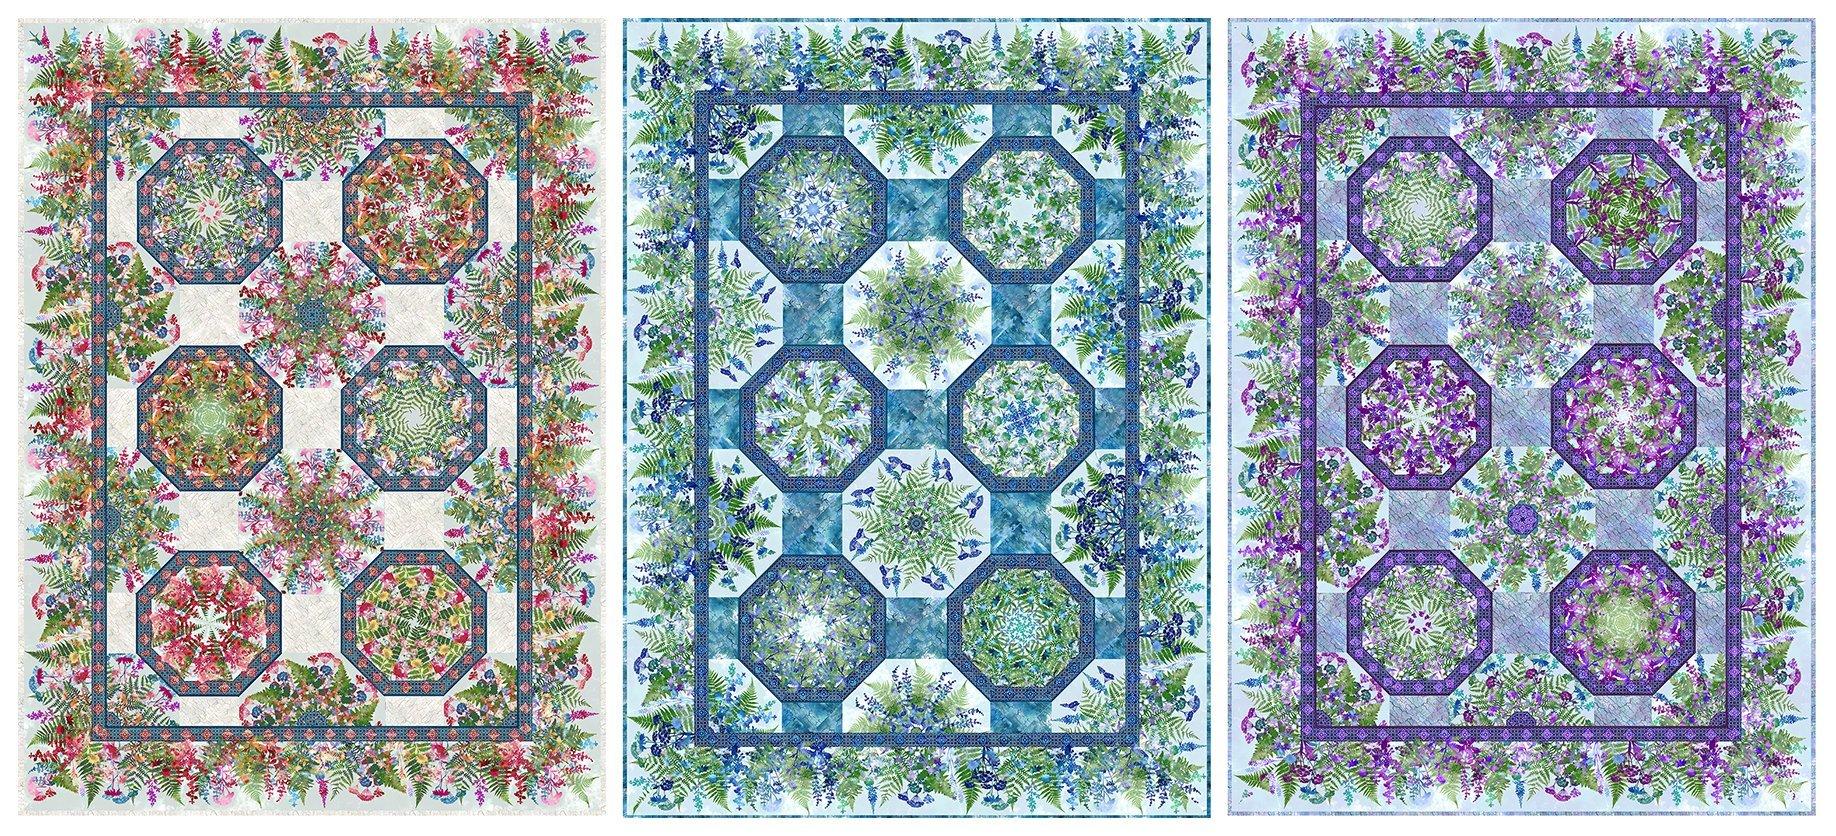 Haven One Fabric Kaleidoscope - In The Beginning/Jason Yenter -  HVN-K